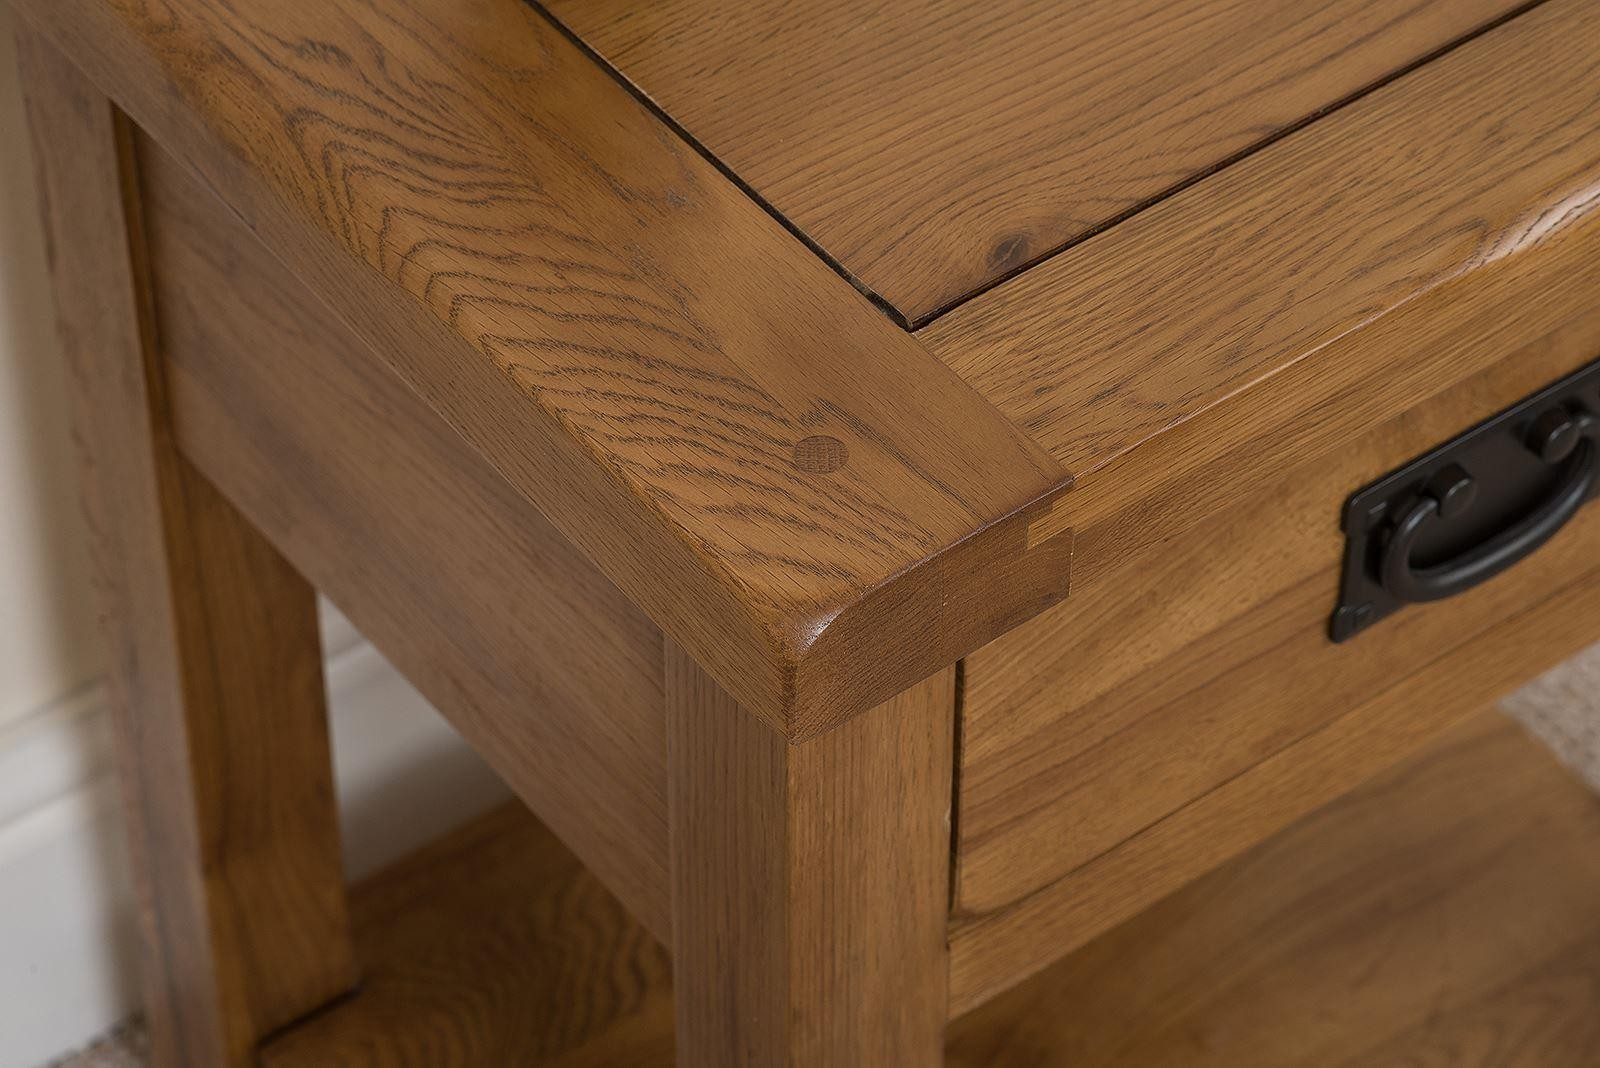 Cotswold oak lamp table modern furniture direct cotswold rustic solid oak lamp table aloadofball Images